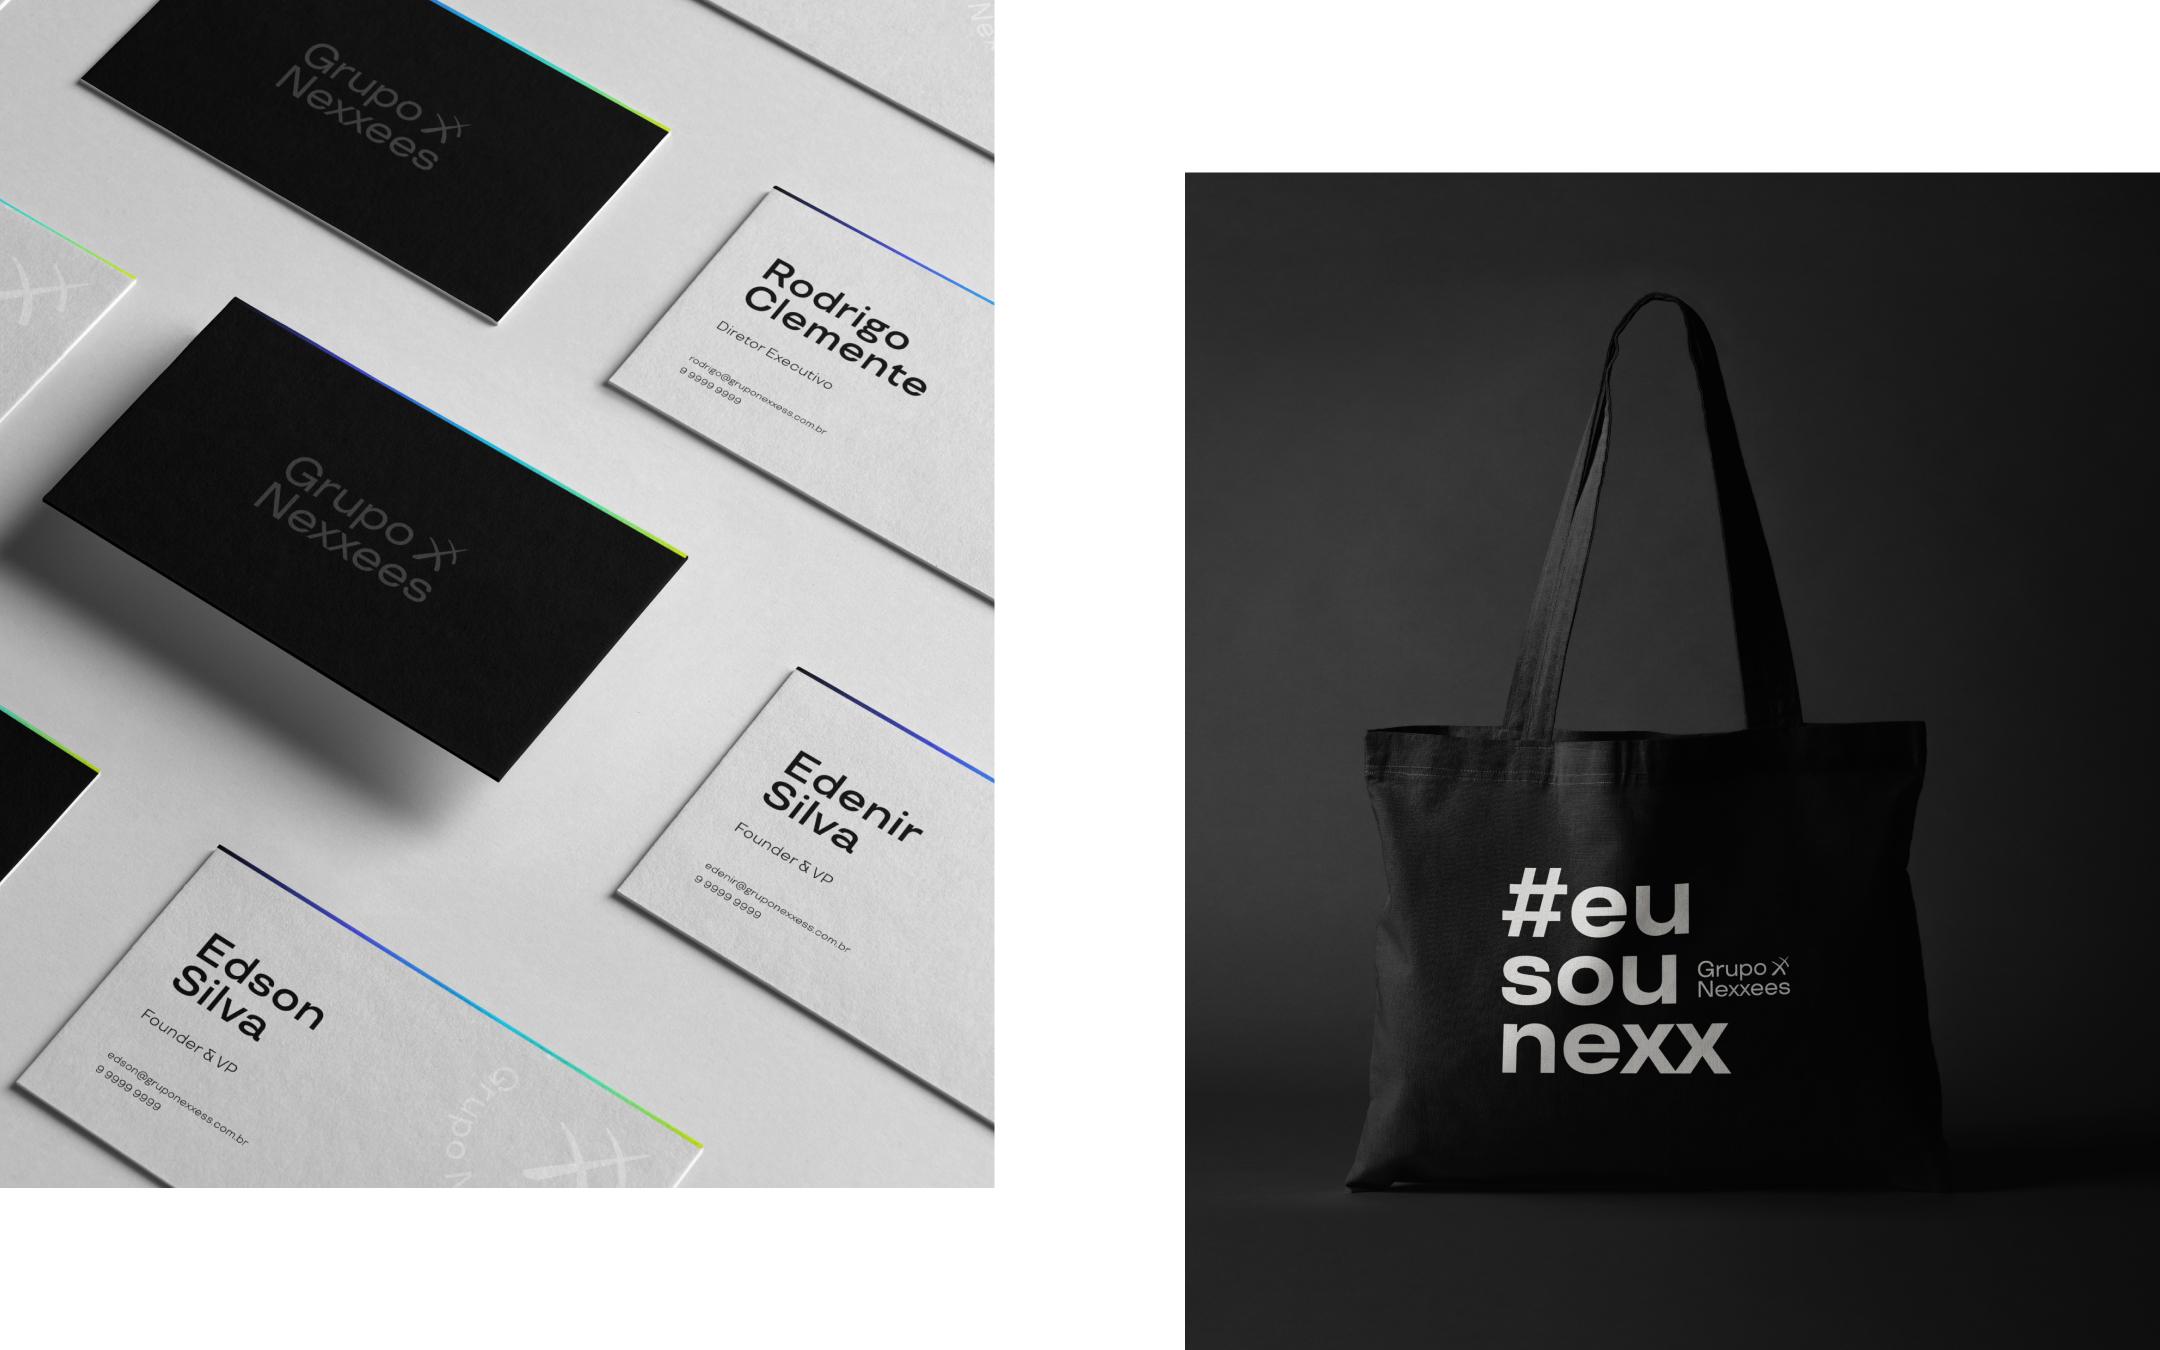 Nexxera-Branding-Rebrand-Design-16-1